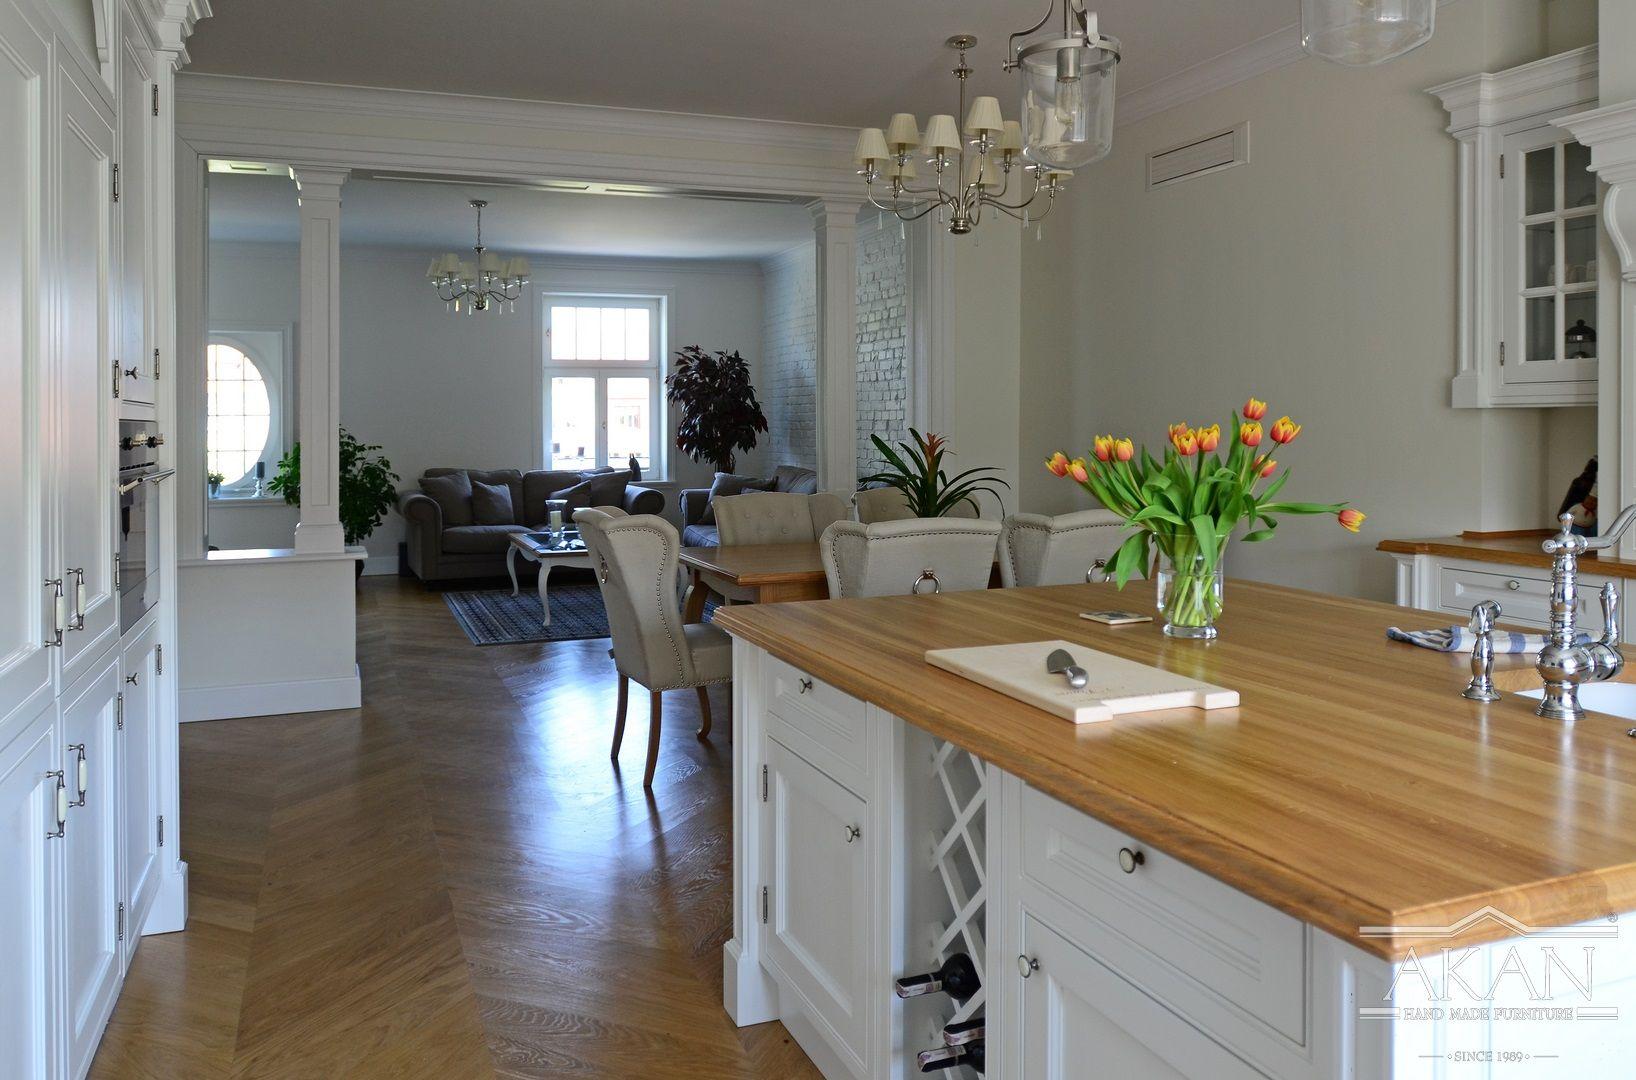 Widok Zabudowy Kuchni W Stylu Klasycznym Z Wyspa Kuchena Kitchen Kitchenideas Kitchenisland Woodkitchen Wood Solidwood Roya Furniture Home Decor Decor